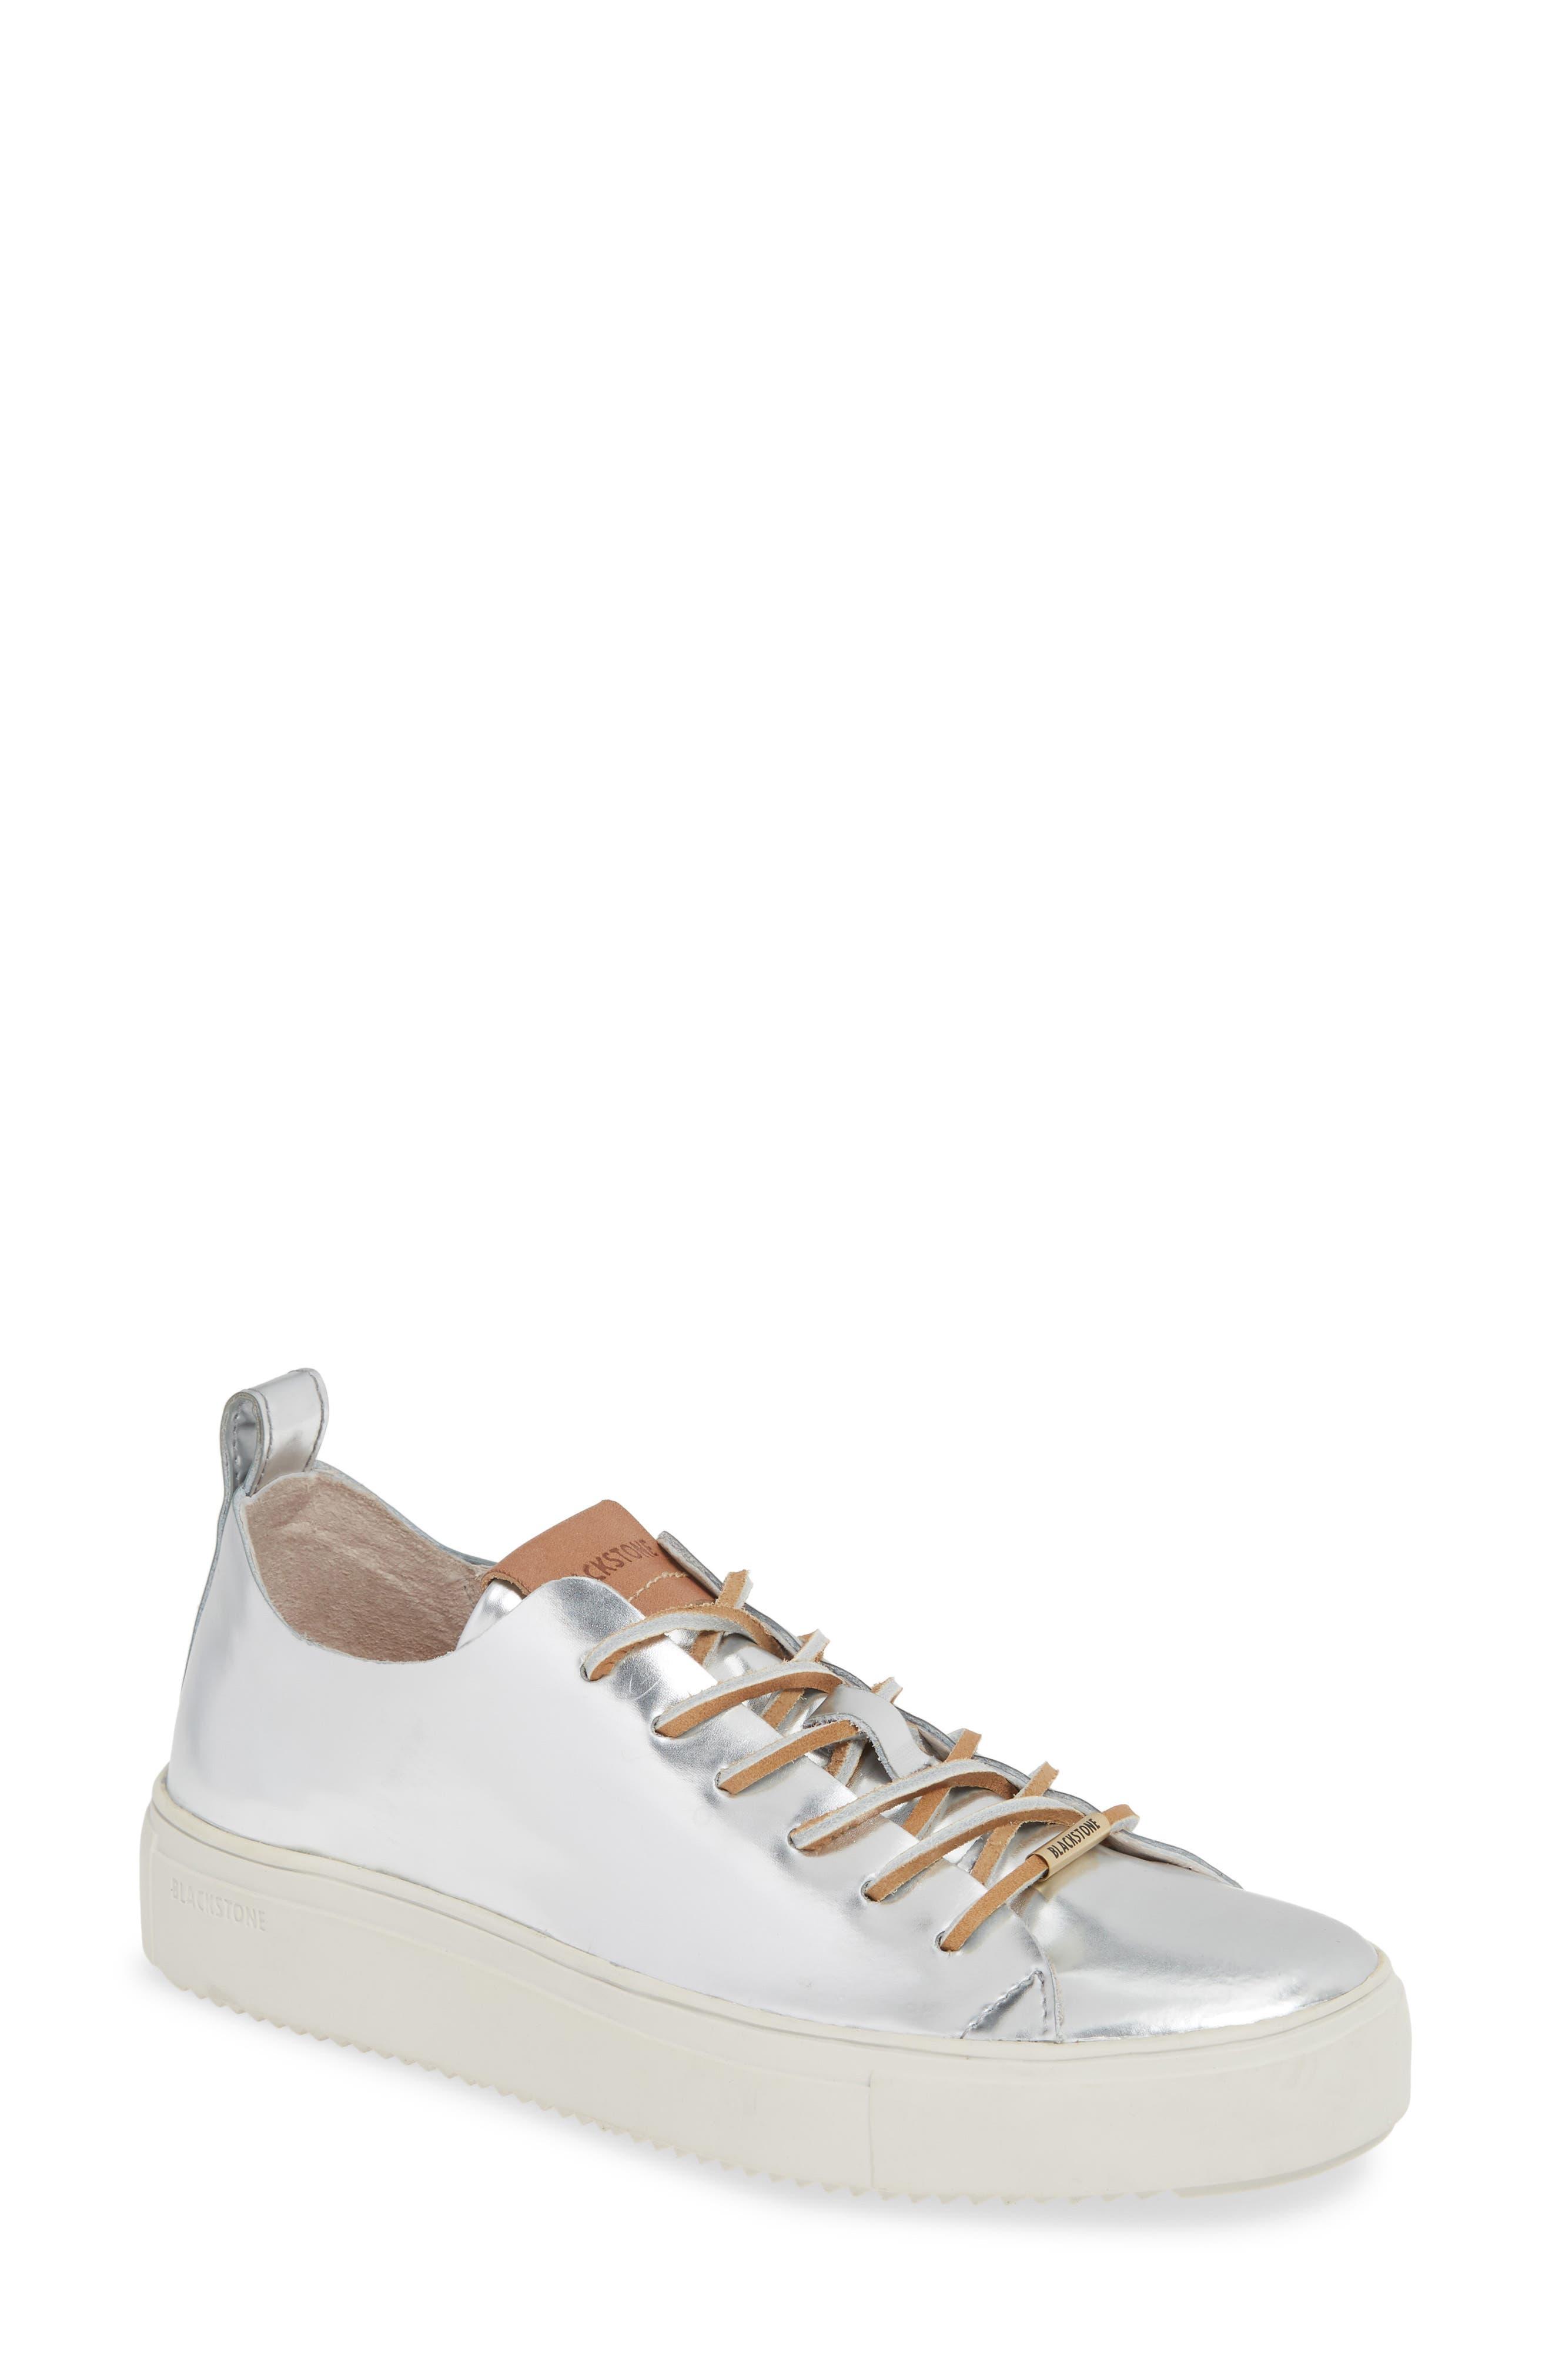 Blackstone Rl69 Metallic Mid Top Sneaker, Metallic